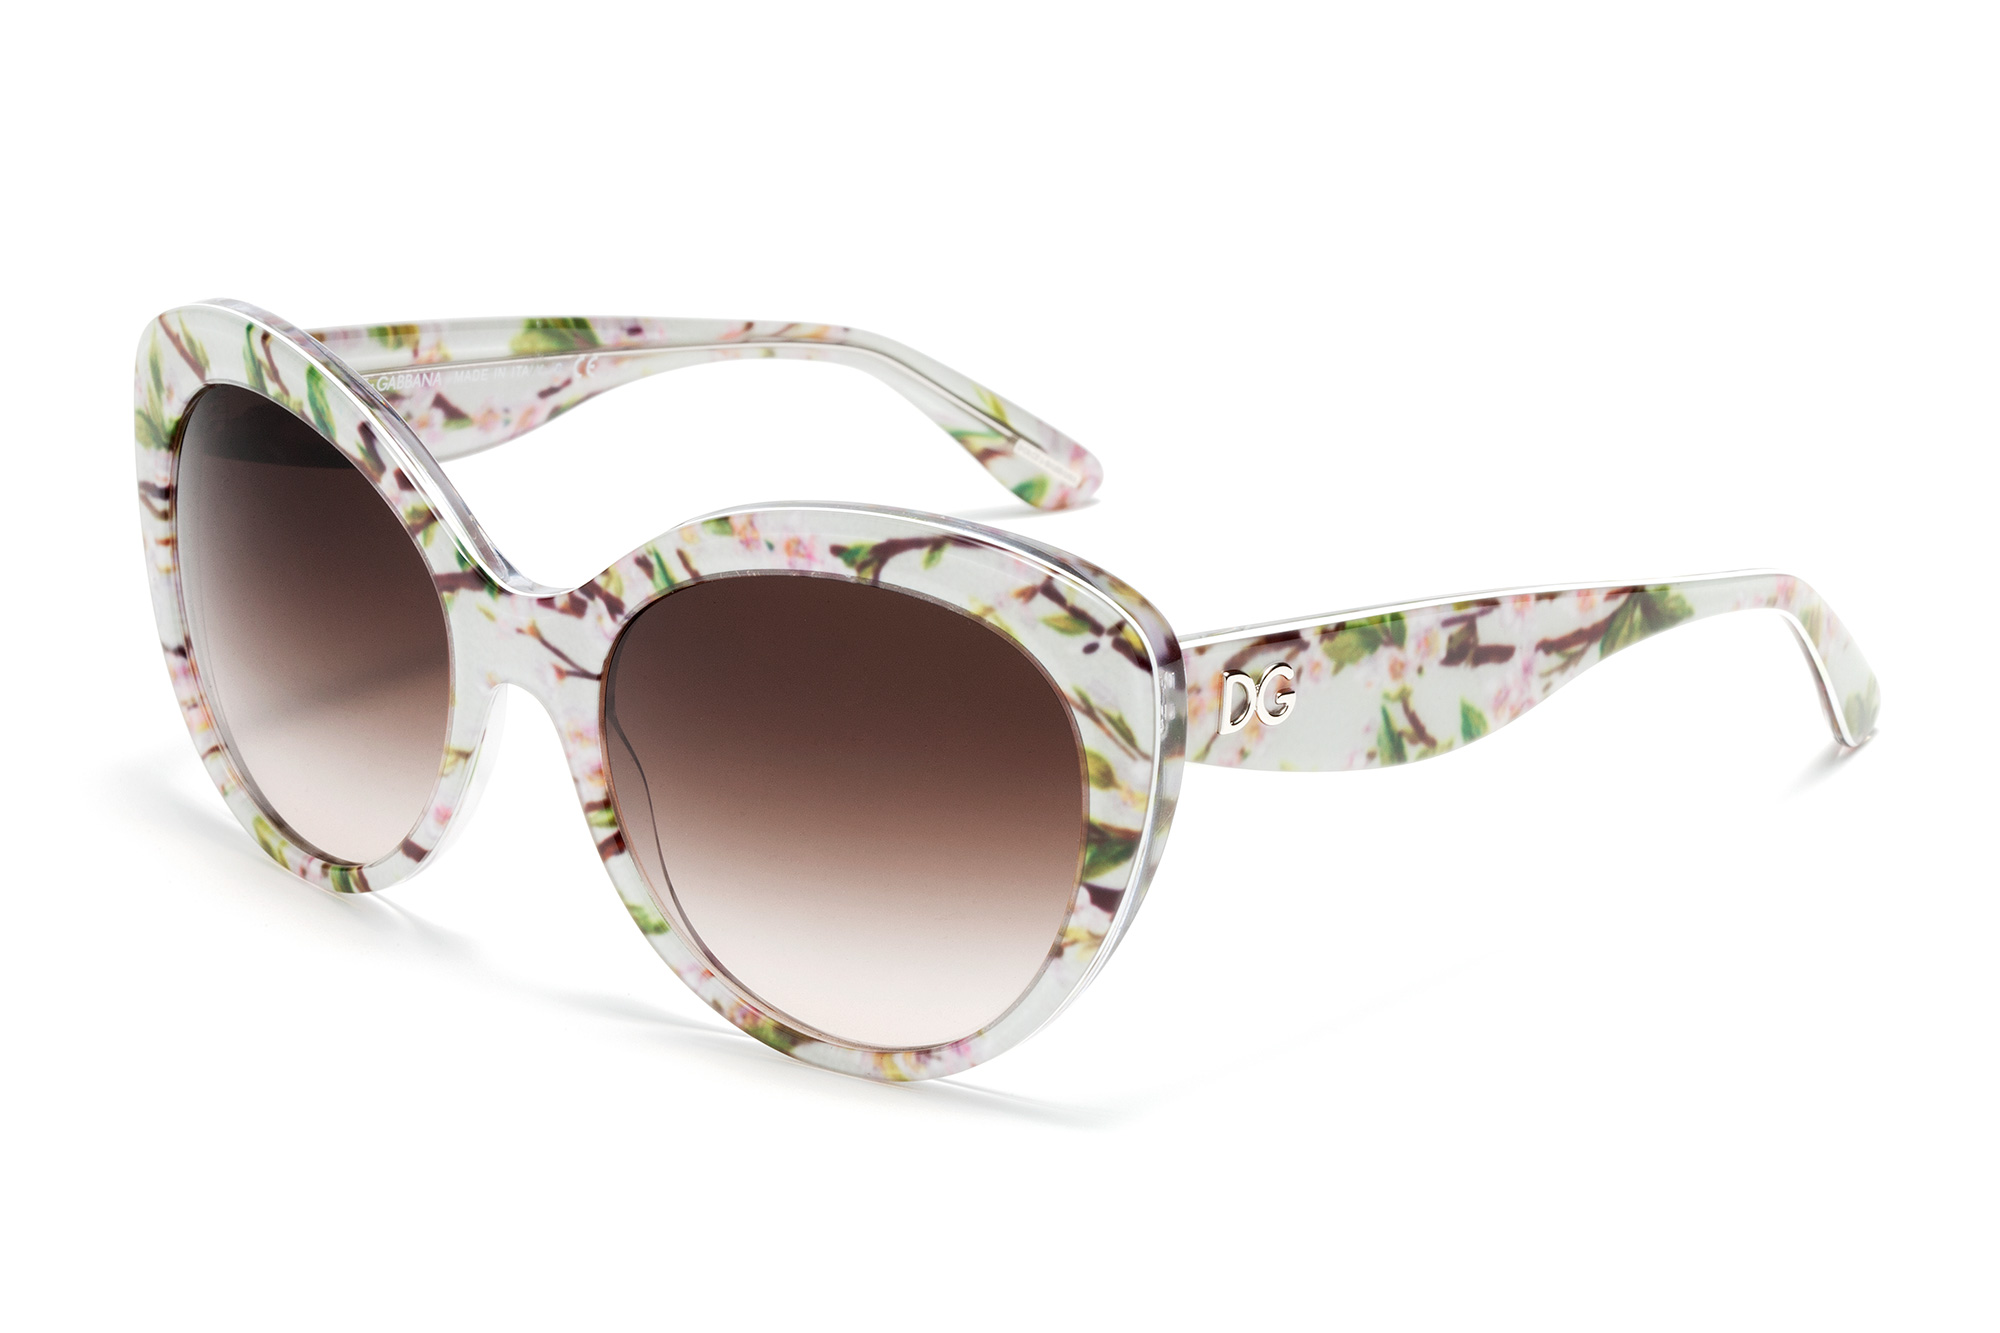 bb65874fb26 dolce-and-gabbana-eyewear-sunglasses-woman-almond-flowers-